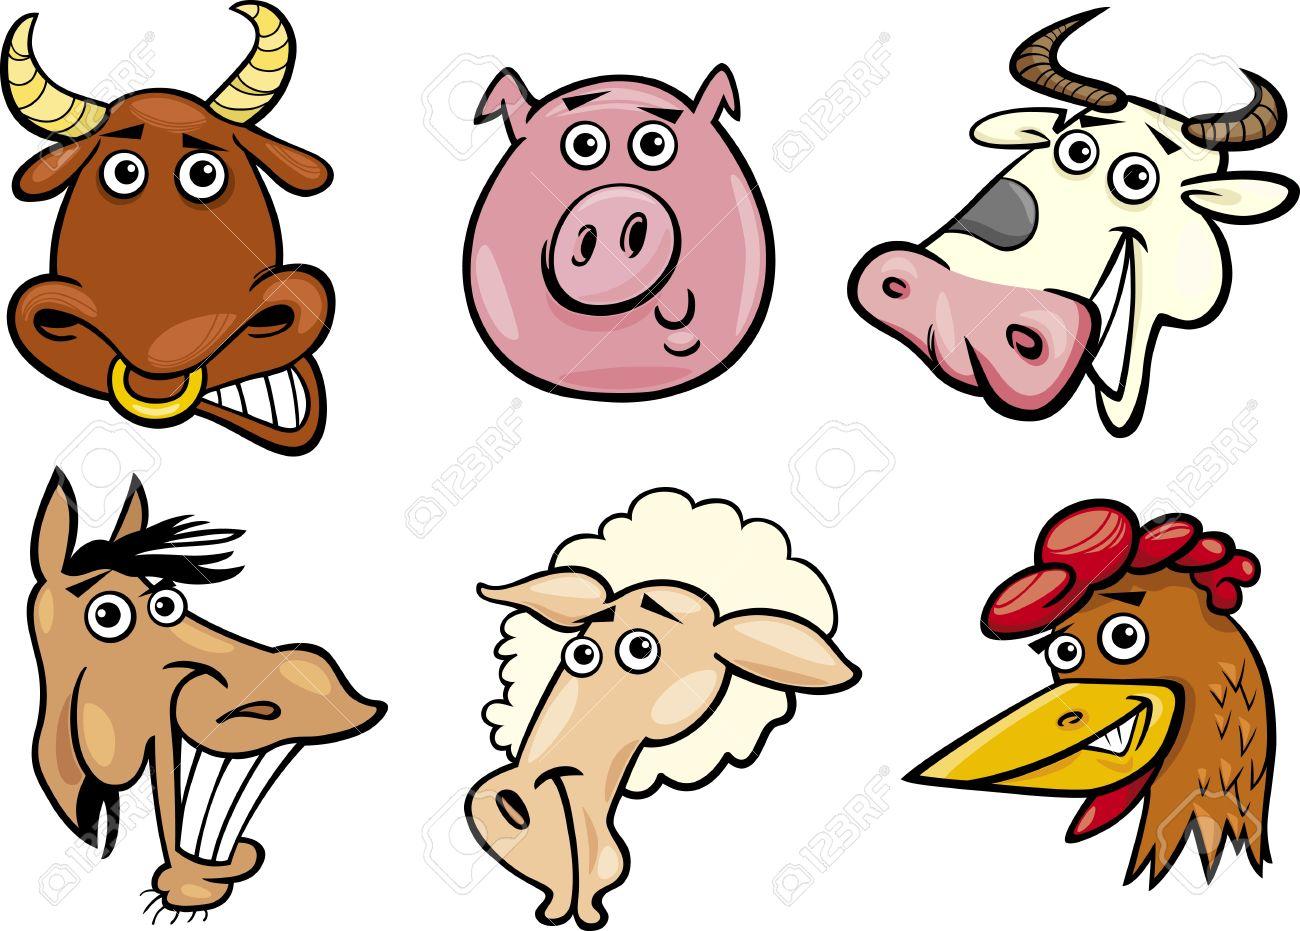 Funny Farm Animals Clipart-Funny Farm Animals Clipart-18